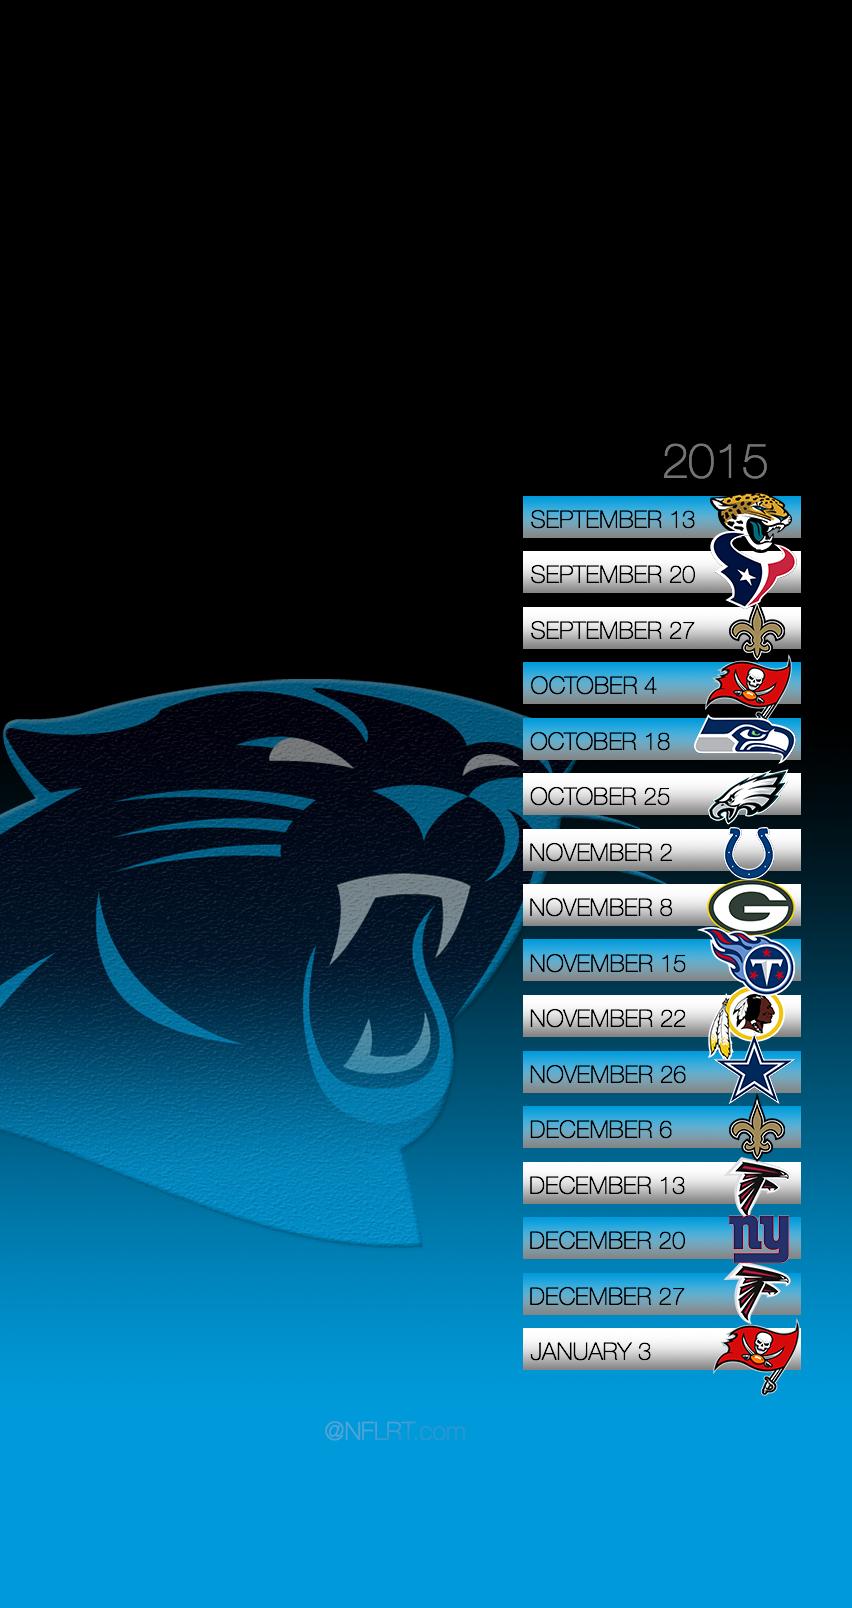 panthers schedule 2015 by nflrt com http nflrt com 2015 nfl schedule 852x1608